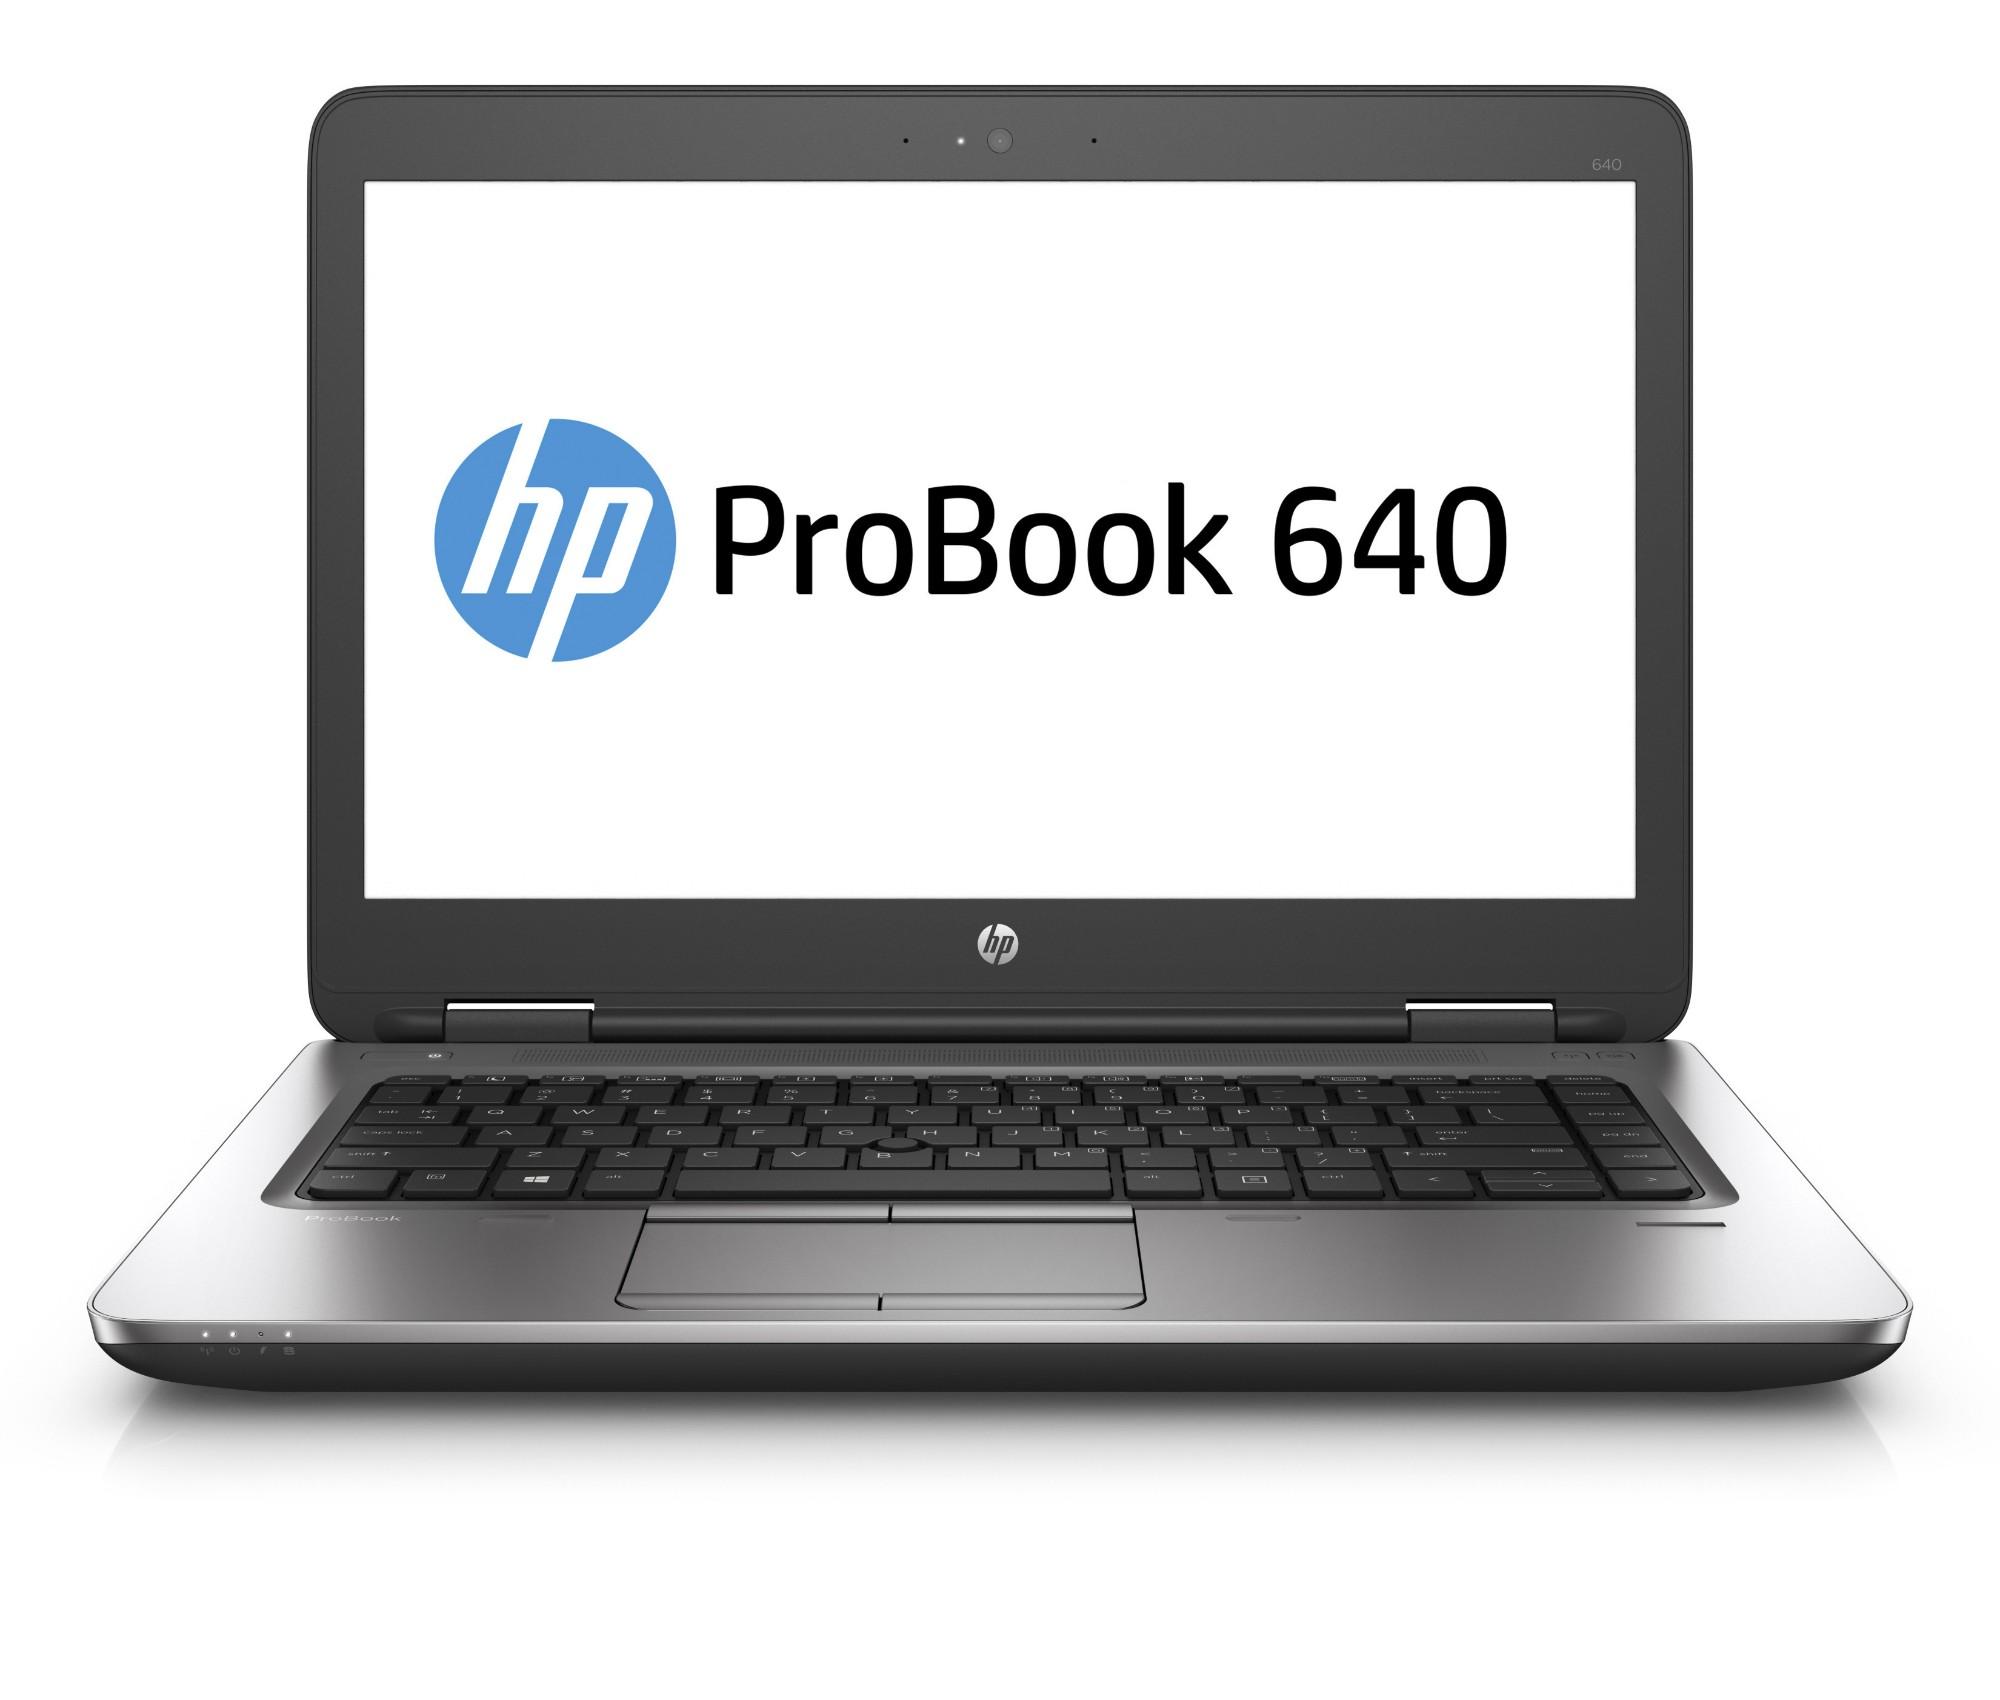 Hpshop hp probook 640 g2 notebook pc hp probook 640 g2 notebook pc reheart Image collections